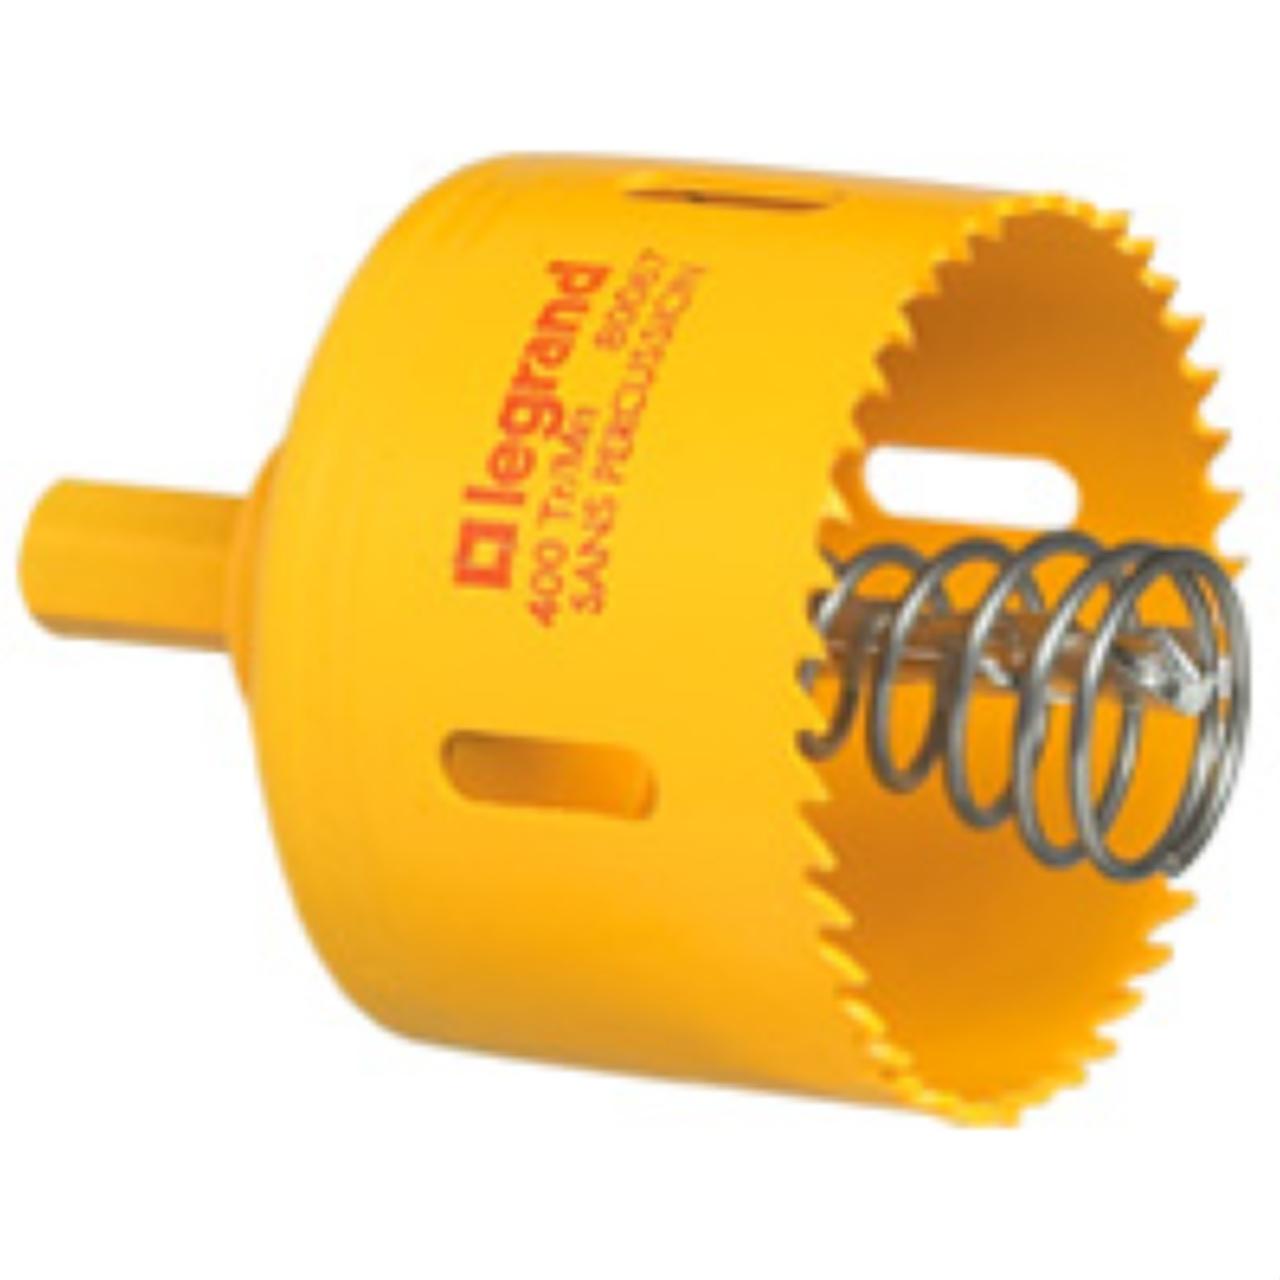 Diametre Scie Cloche Prise De Courant scie cloche diamÈtre 85 mm pour boÎte prise 20/32a legrand batibox